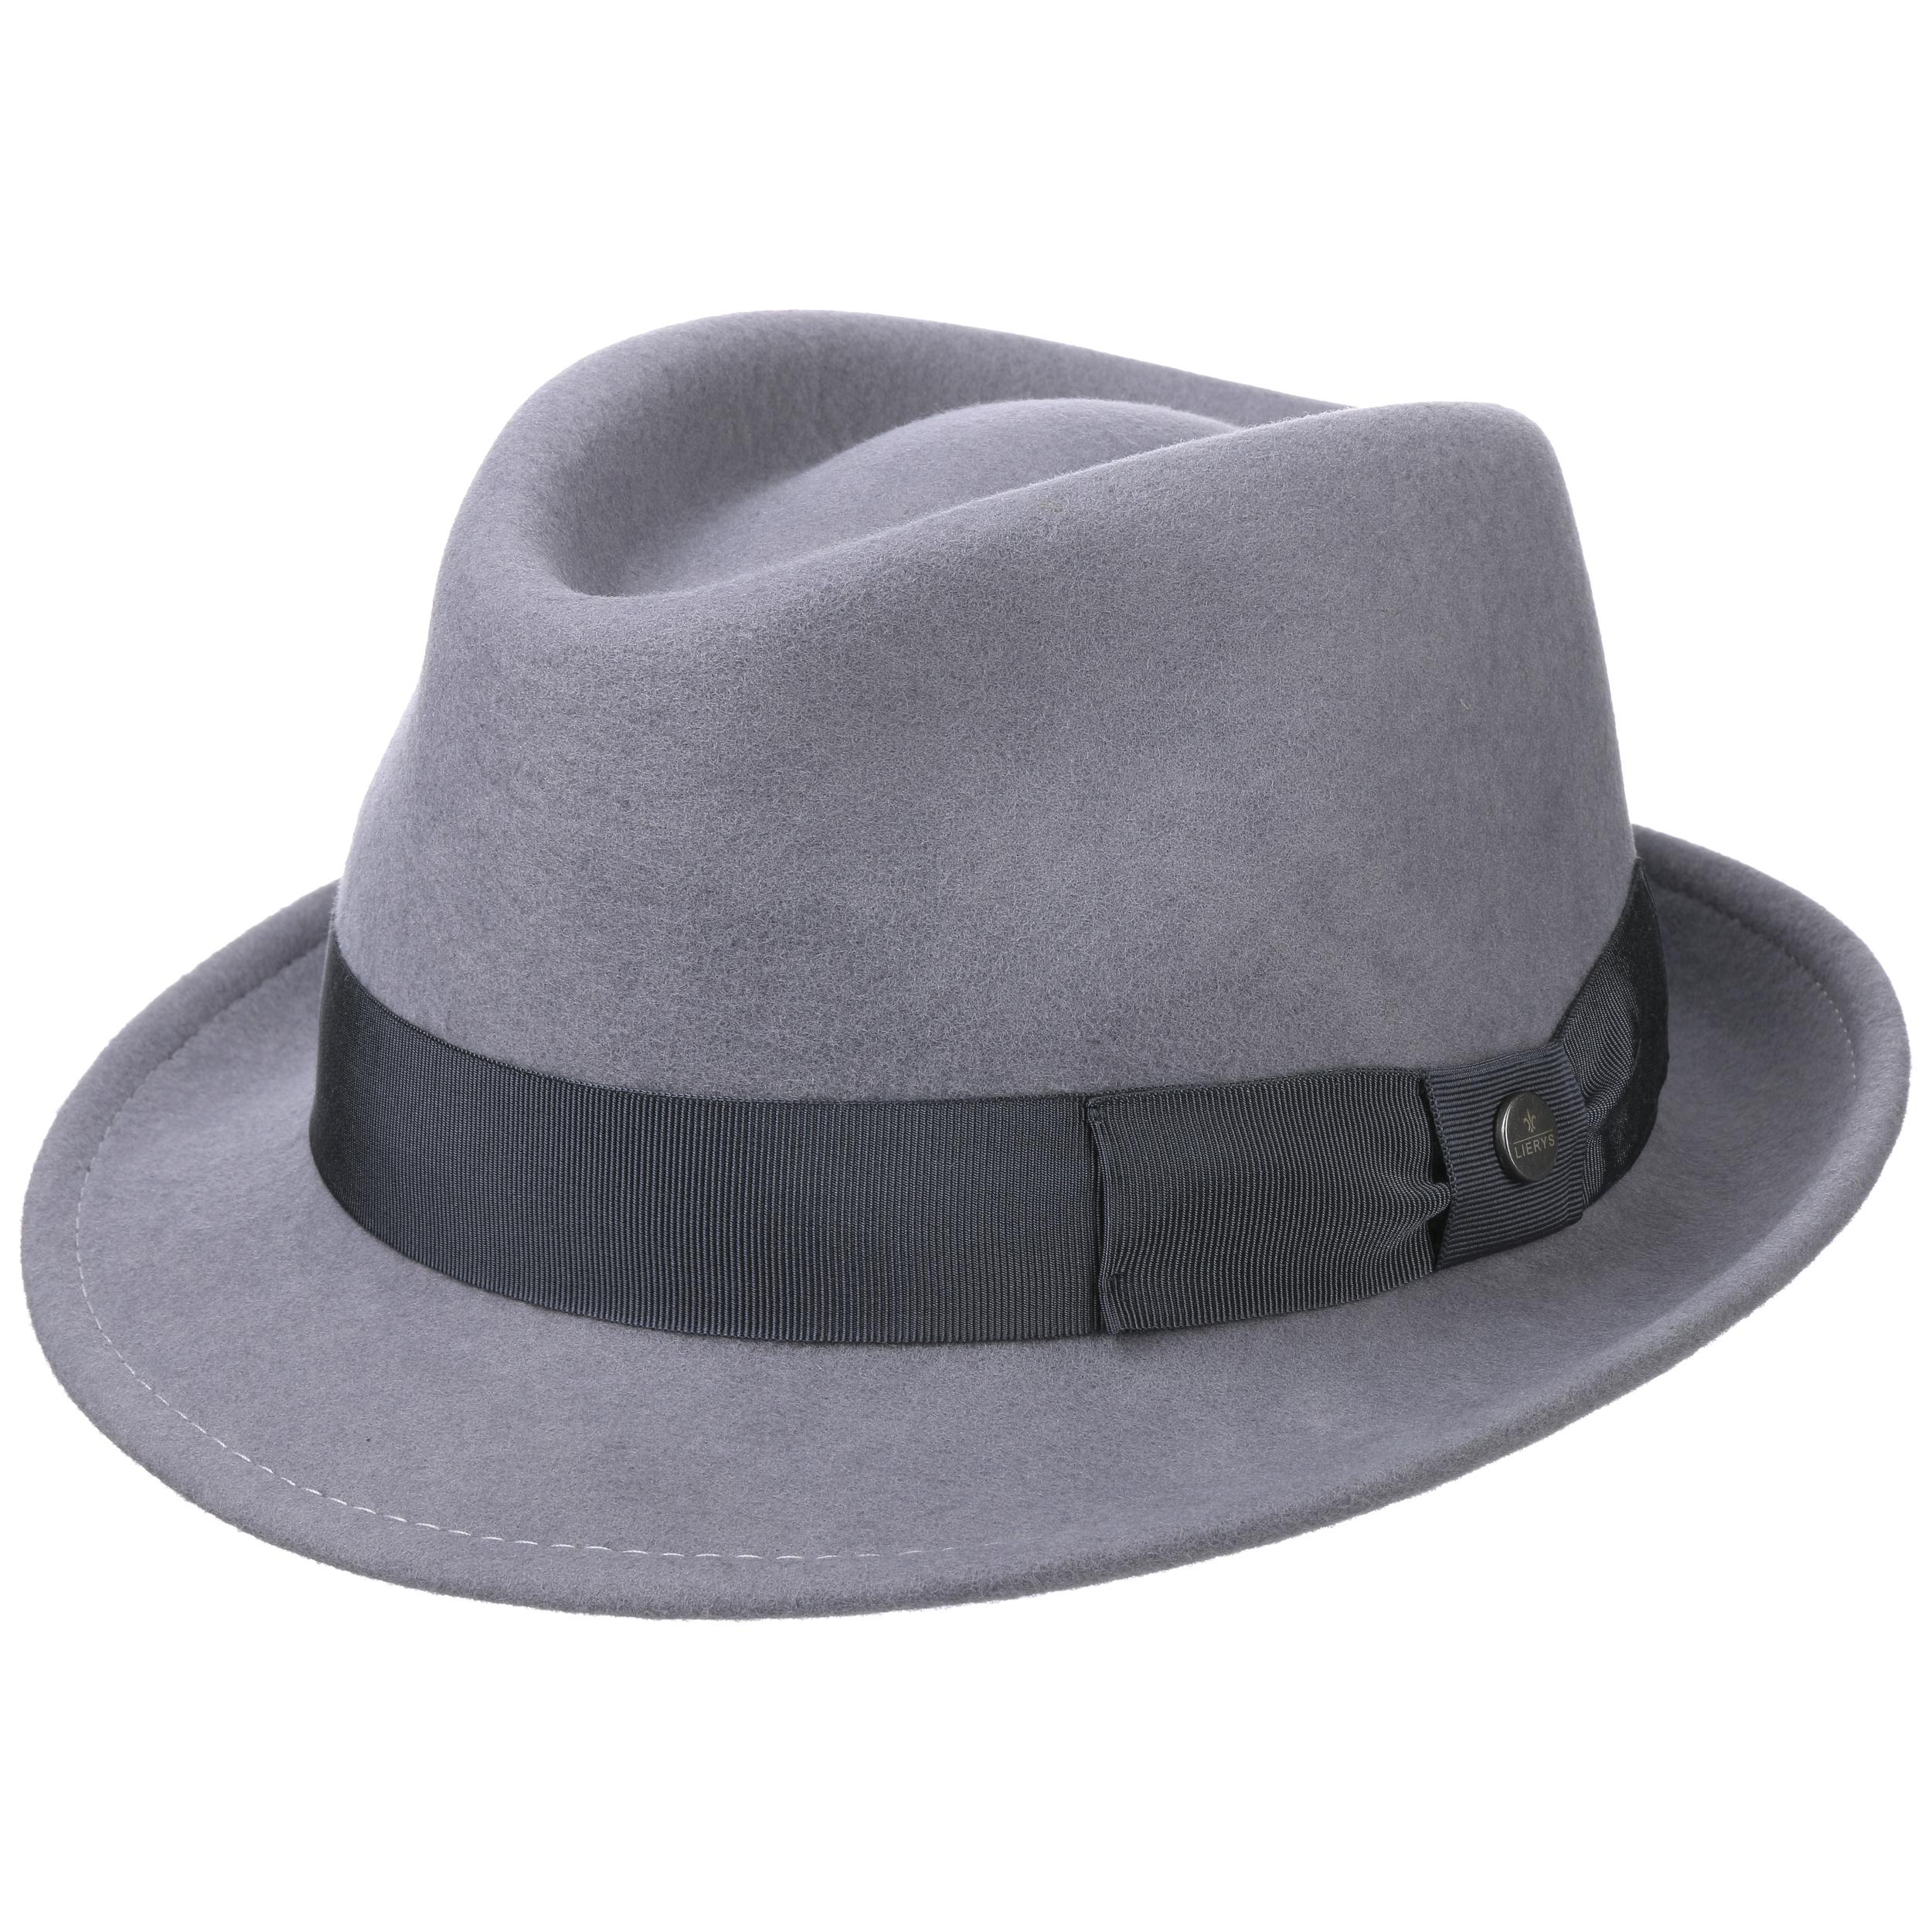 Sombrero Classic Wool Trilby by Lierys - Sombreros - sombreroshop.es d11700c02e2